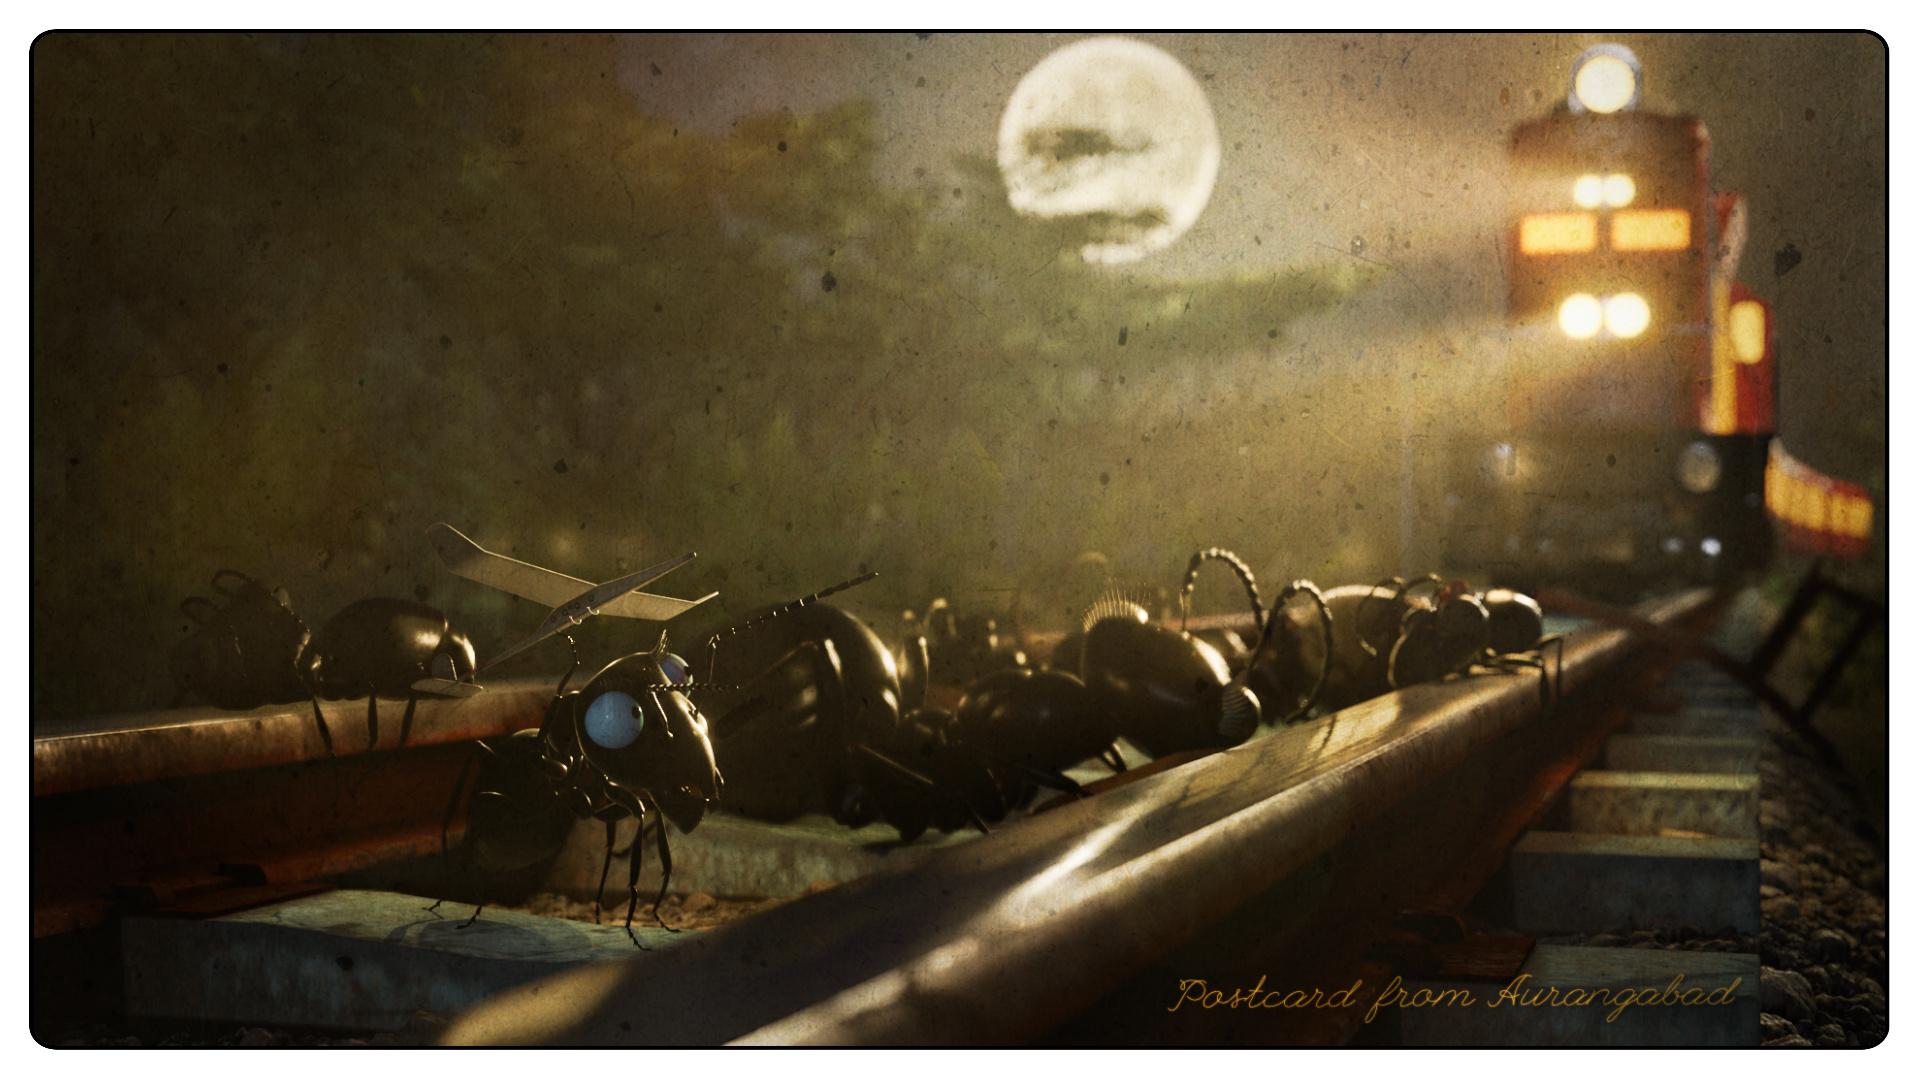 #9 Postcard from Tuktuk_Migration_Tragedy